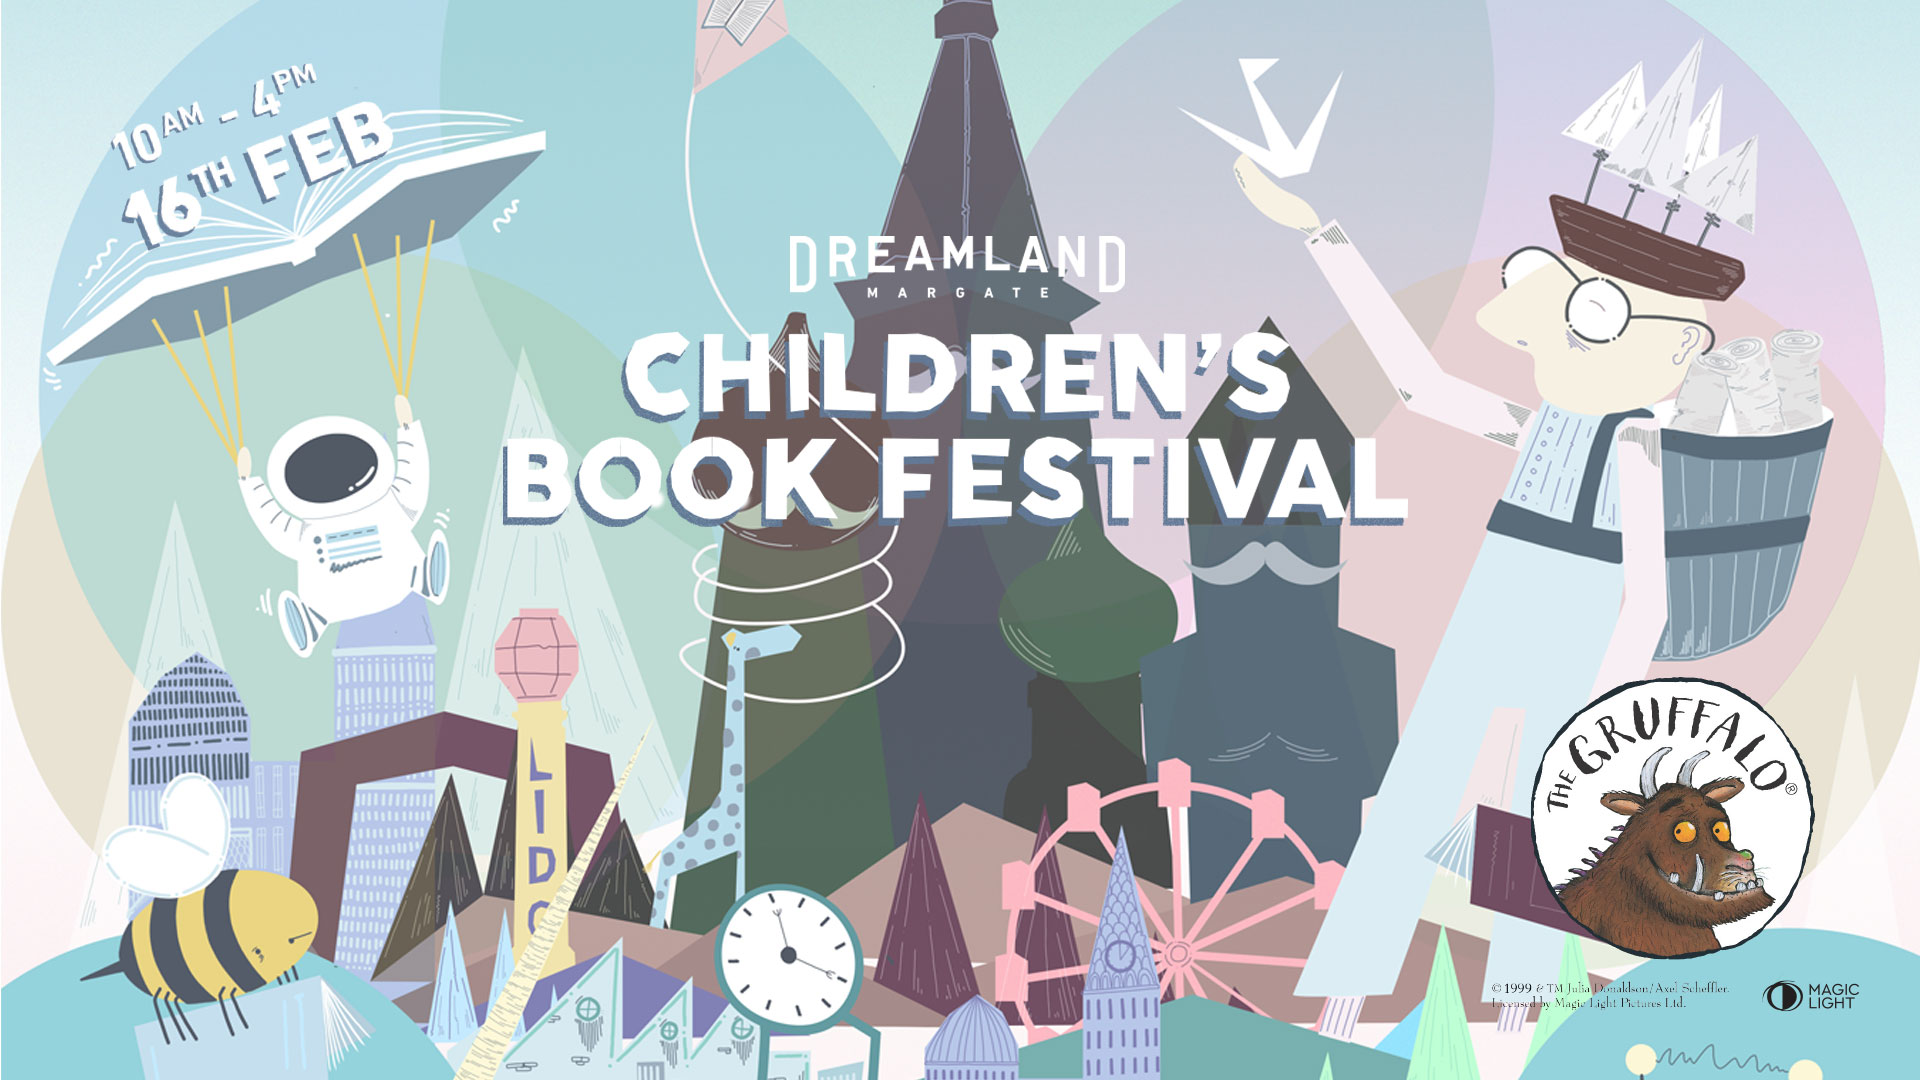 Dreamland's first children's book festival